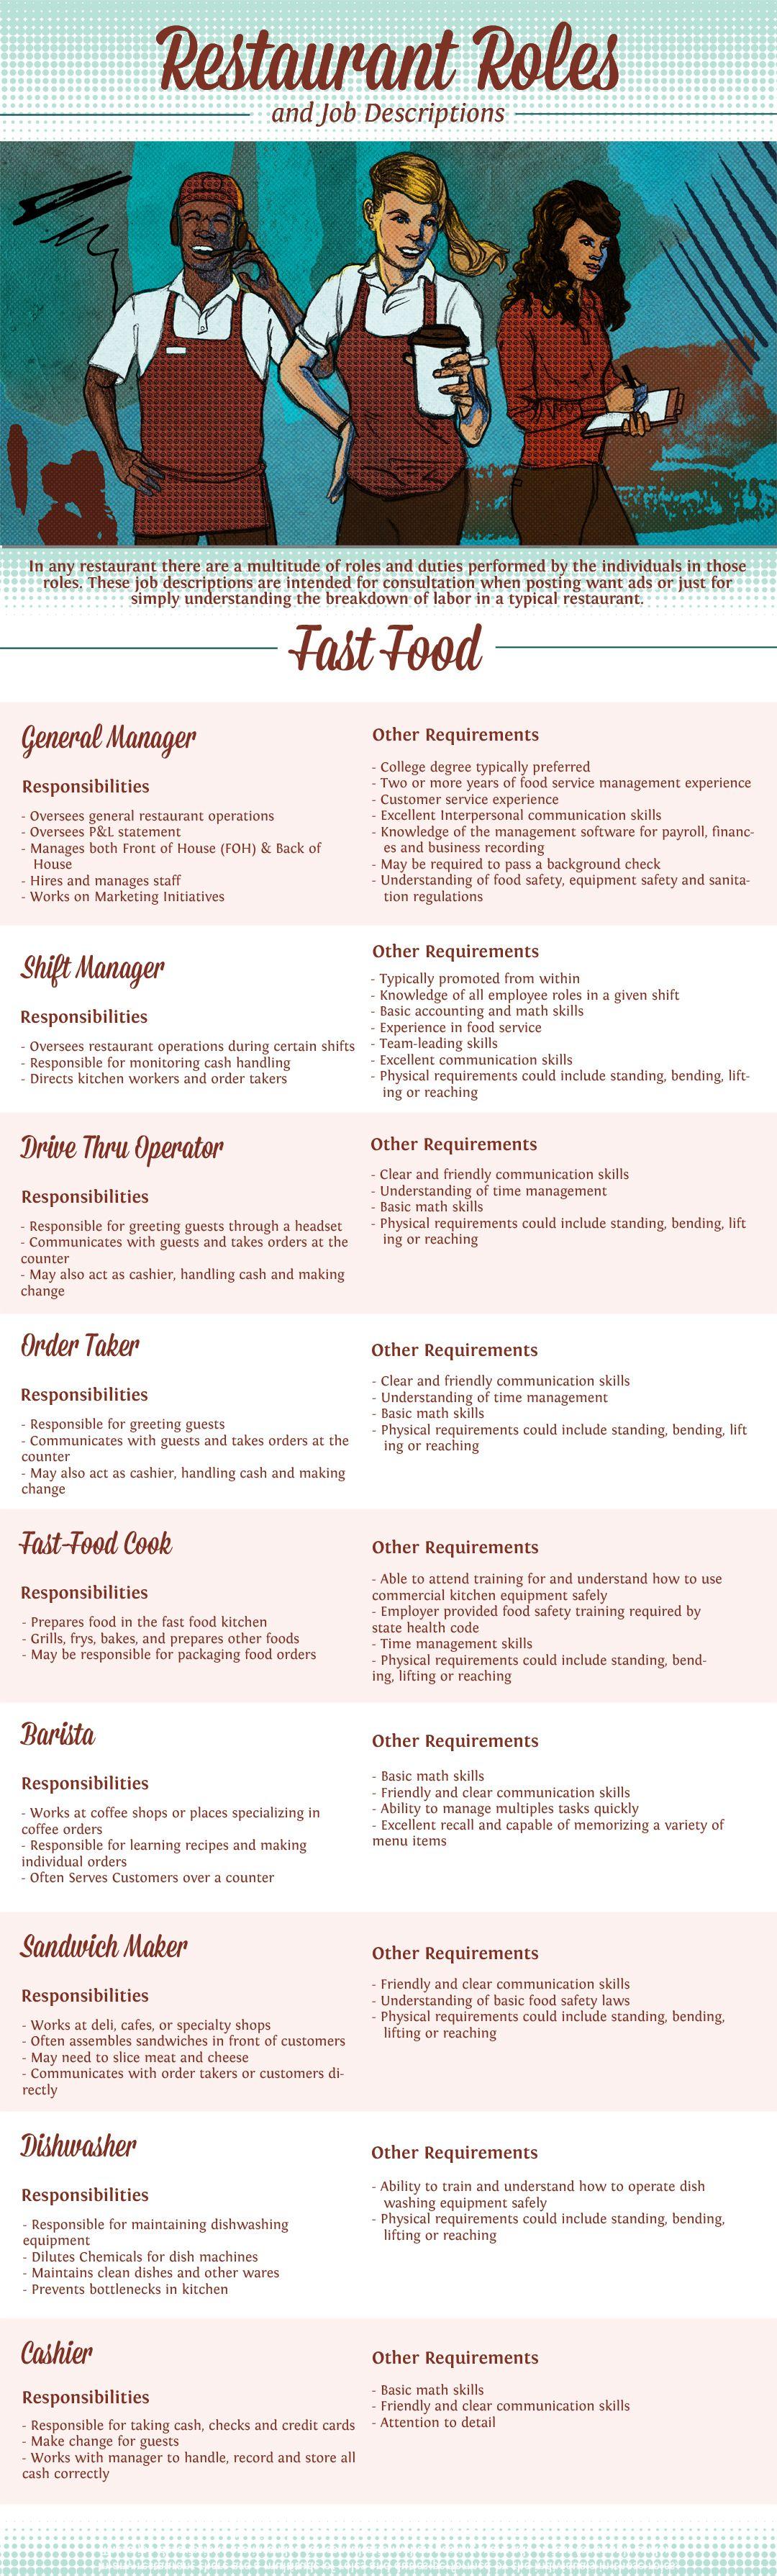 1000 images about job info on pinterest resume restaurant